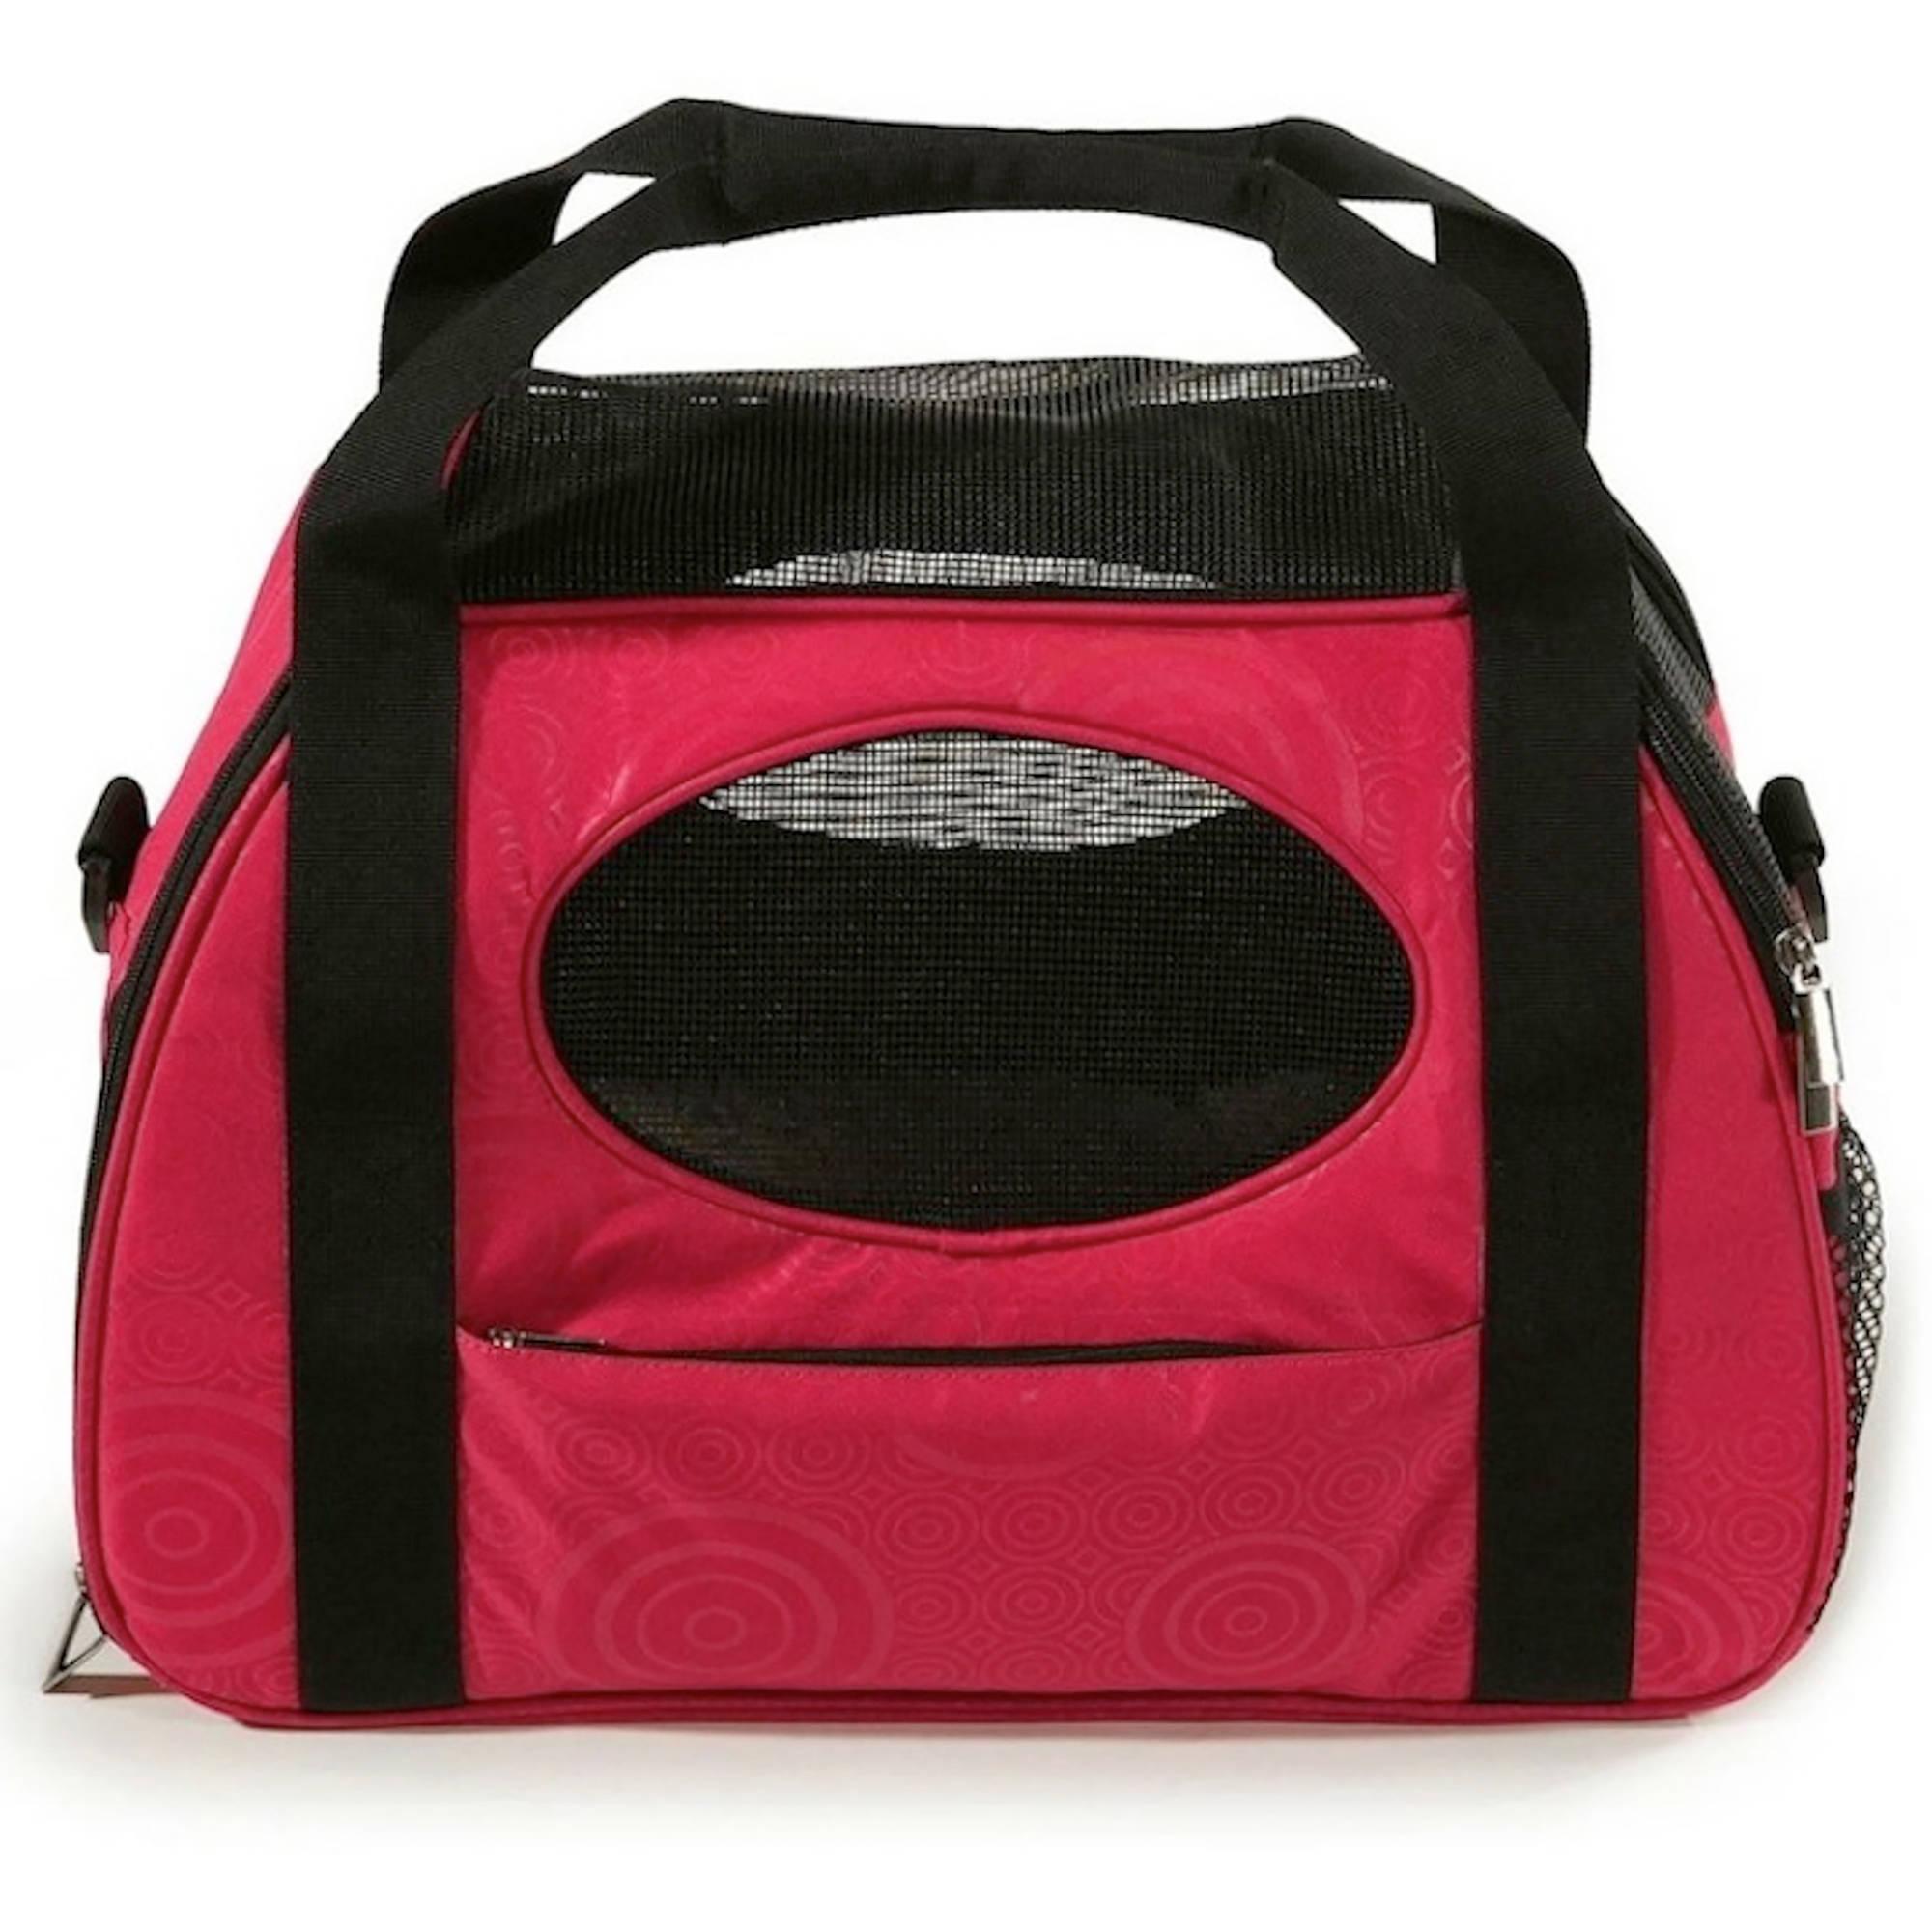 Gen7Pets Carry-Me Pet Carrier, Raspberry Sorbet